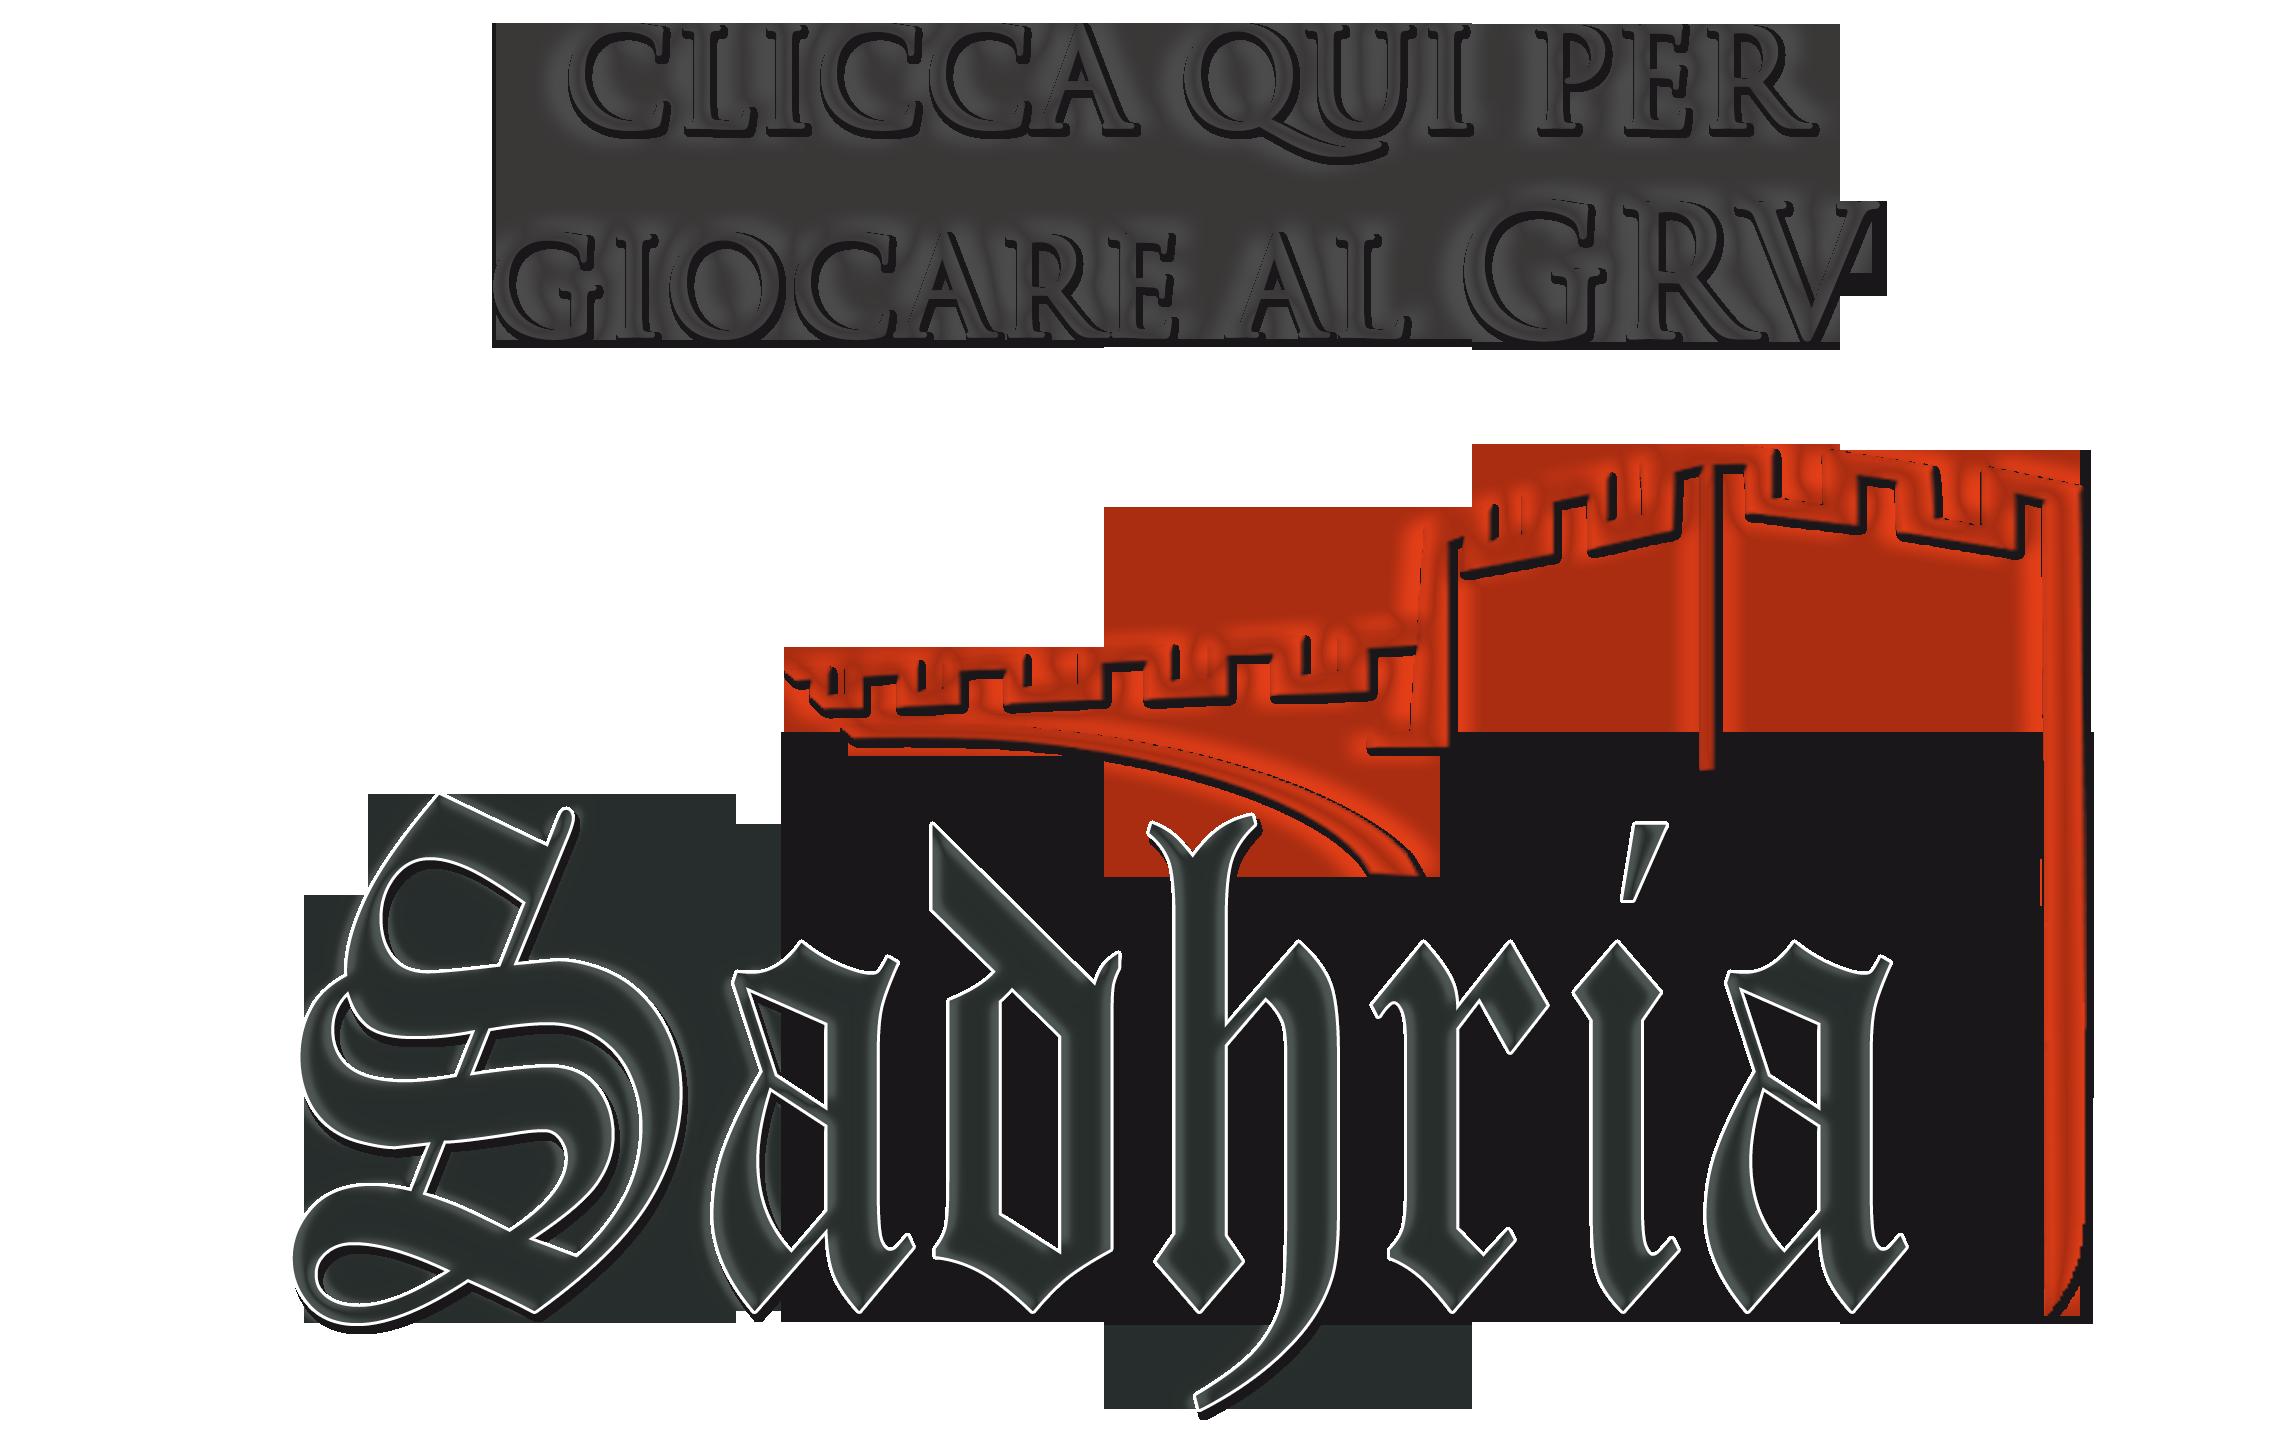 GrV Sadhria